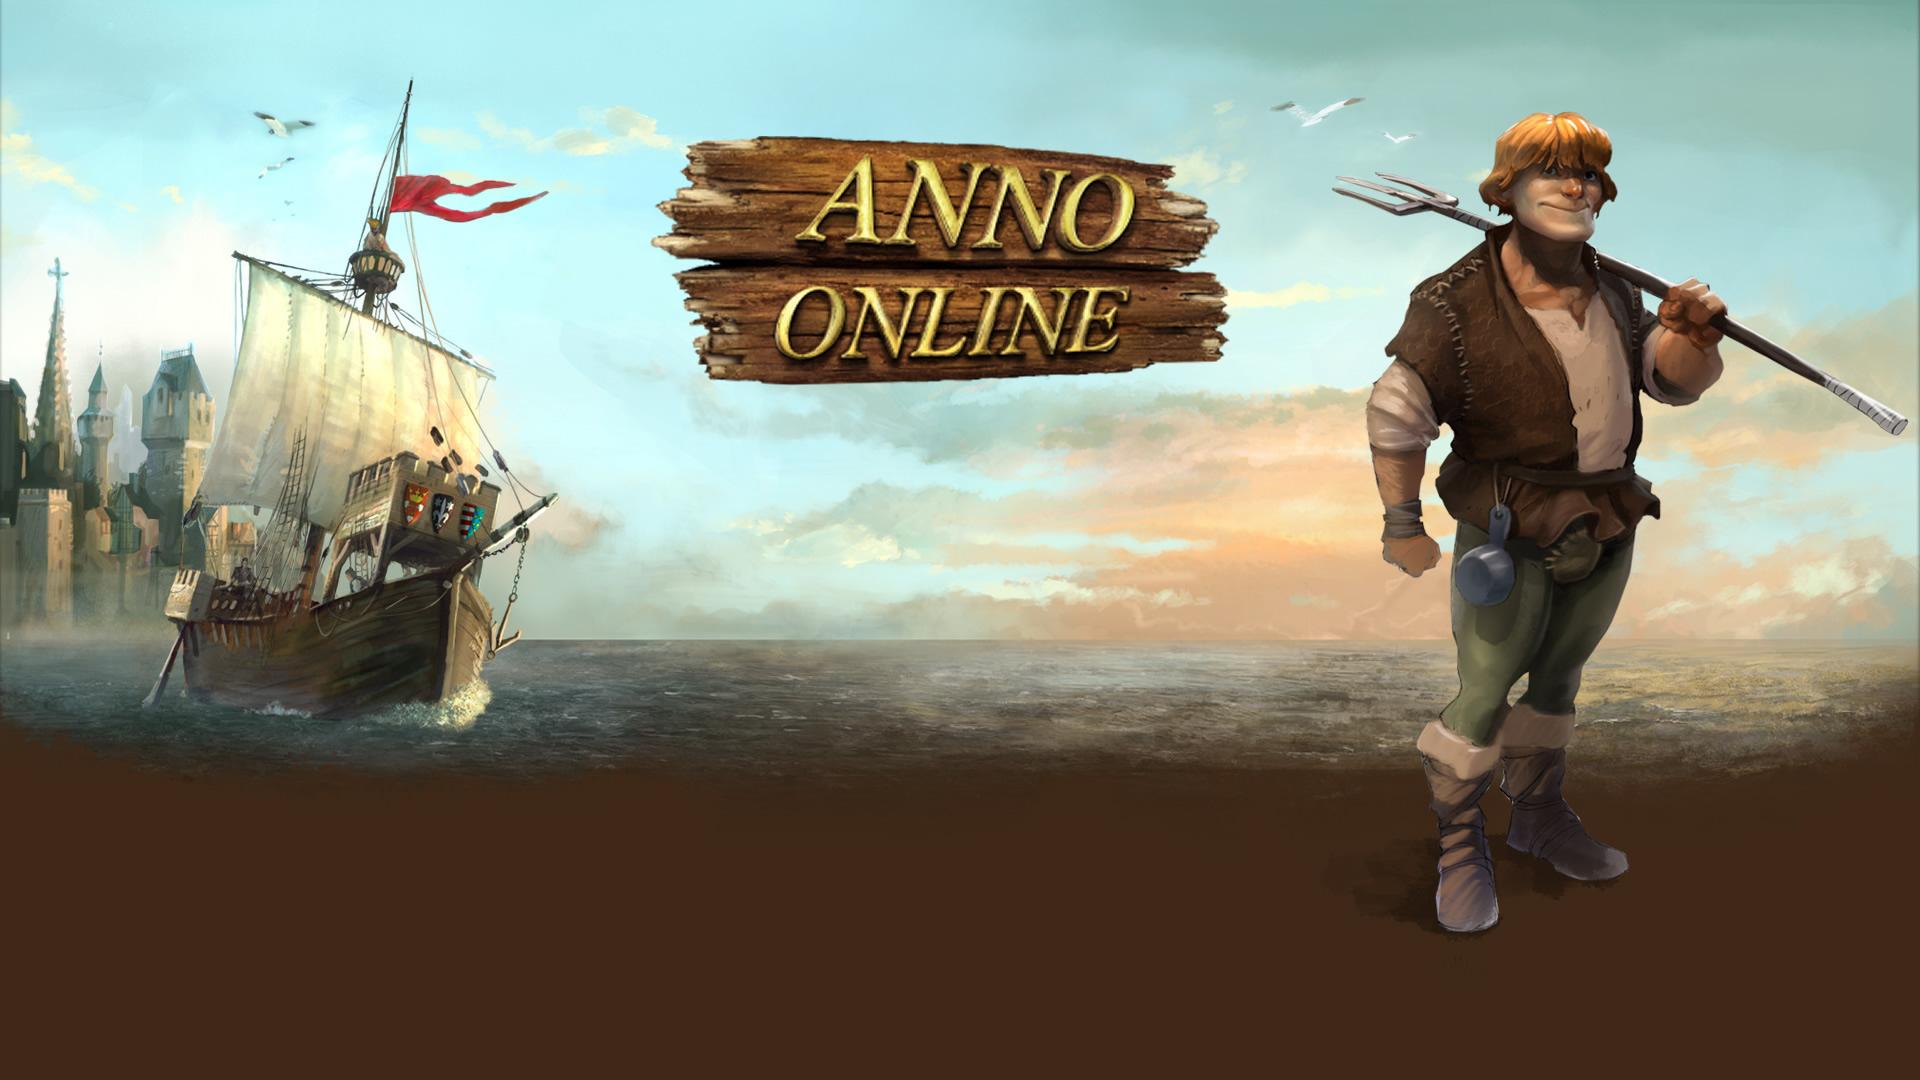 ANNO Онлайн